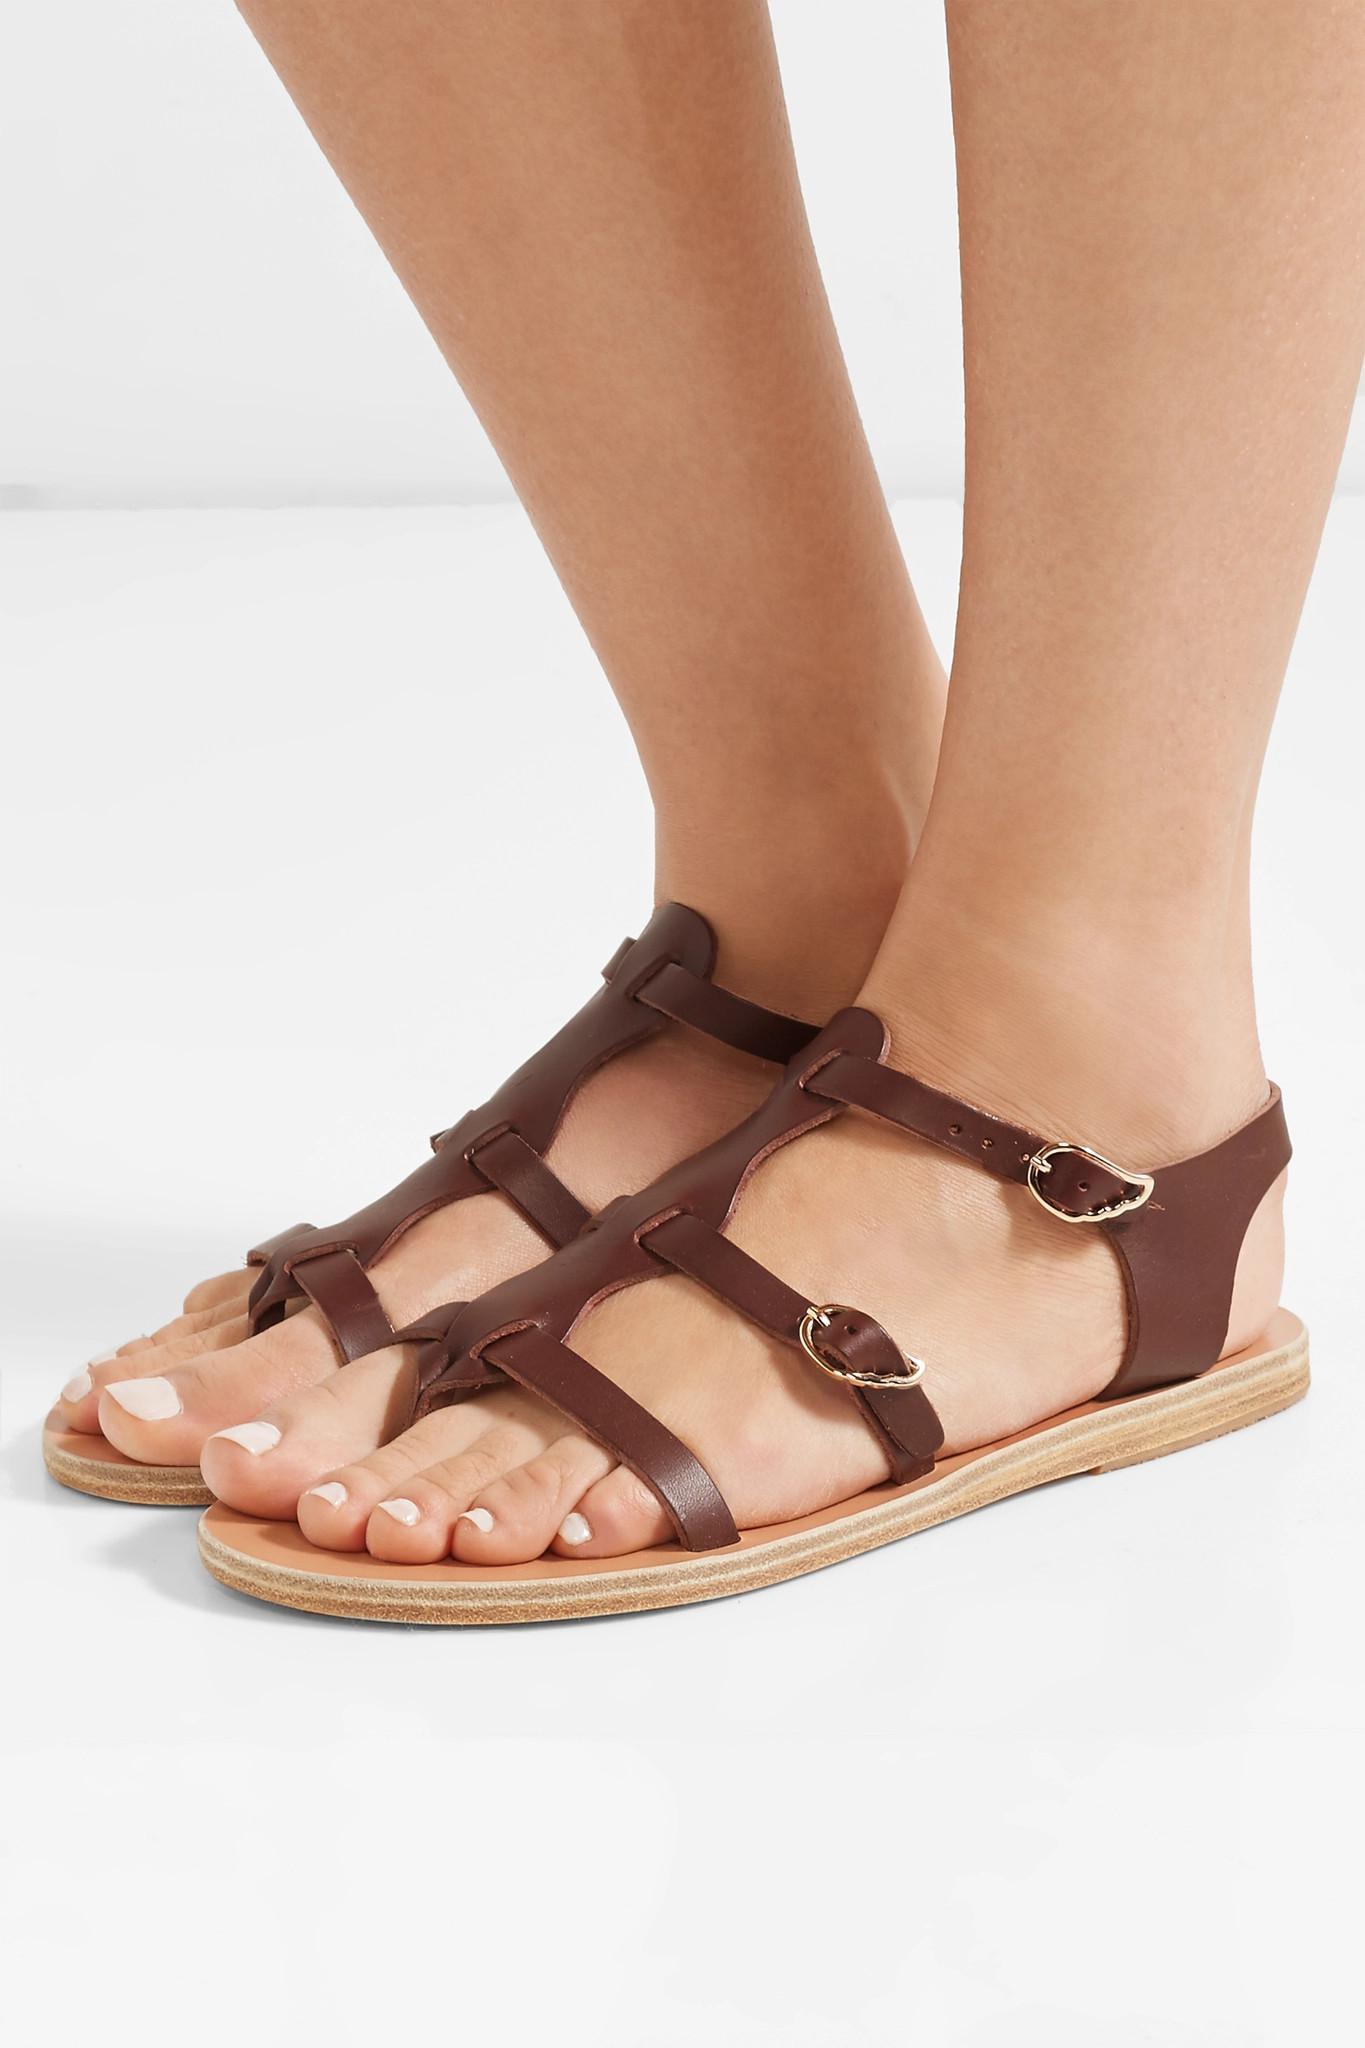 fbd5b8d87 Ancient Greek Sandals - Brown Grace Kelly Leather Sandals - Lyst. View  fullscreen